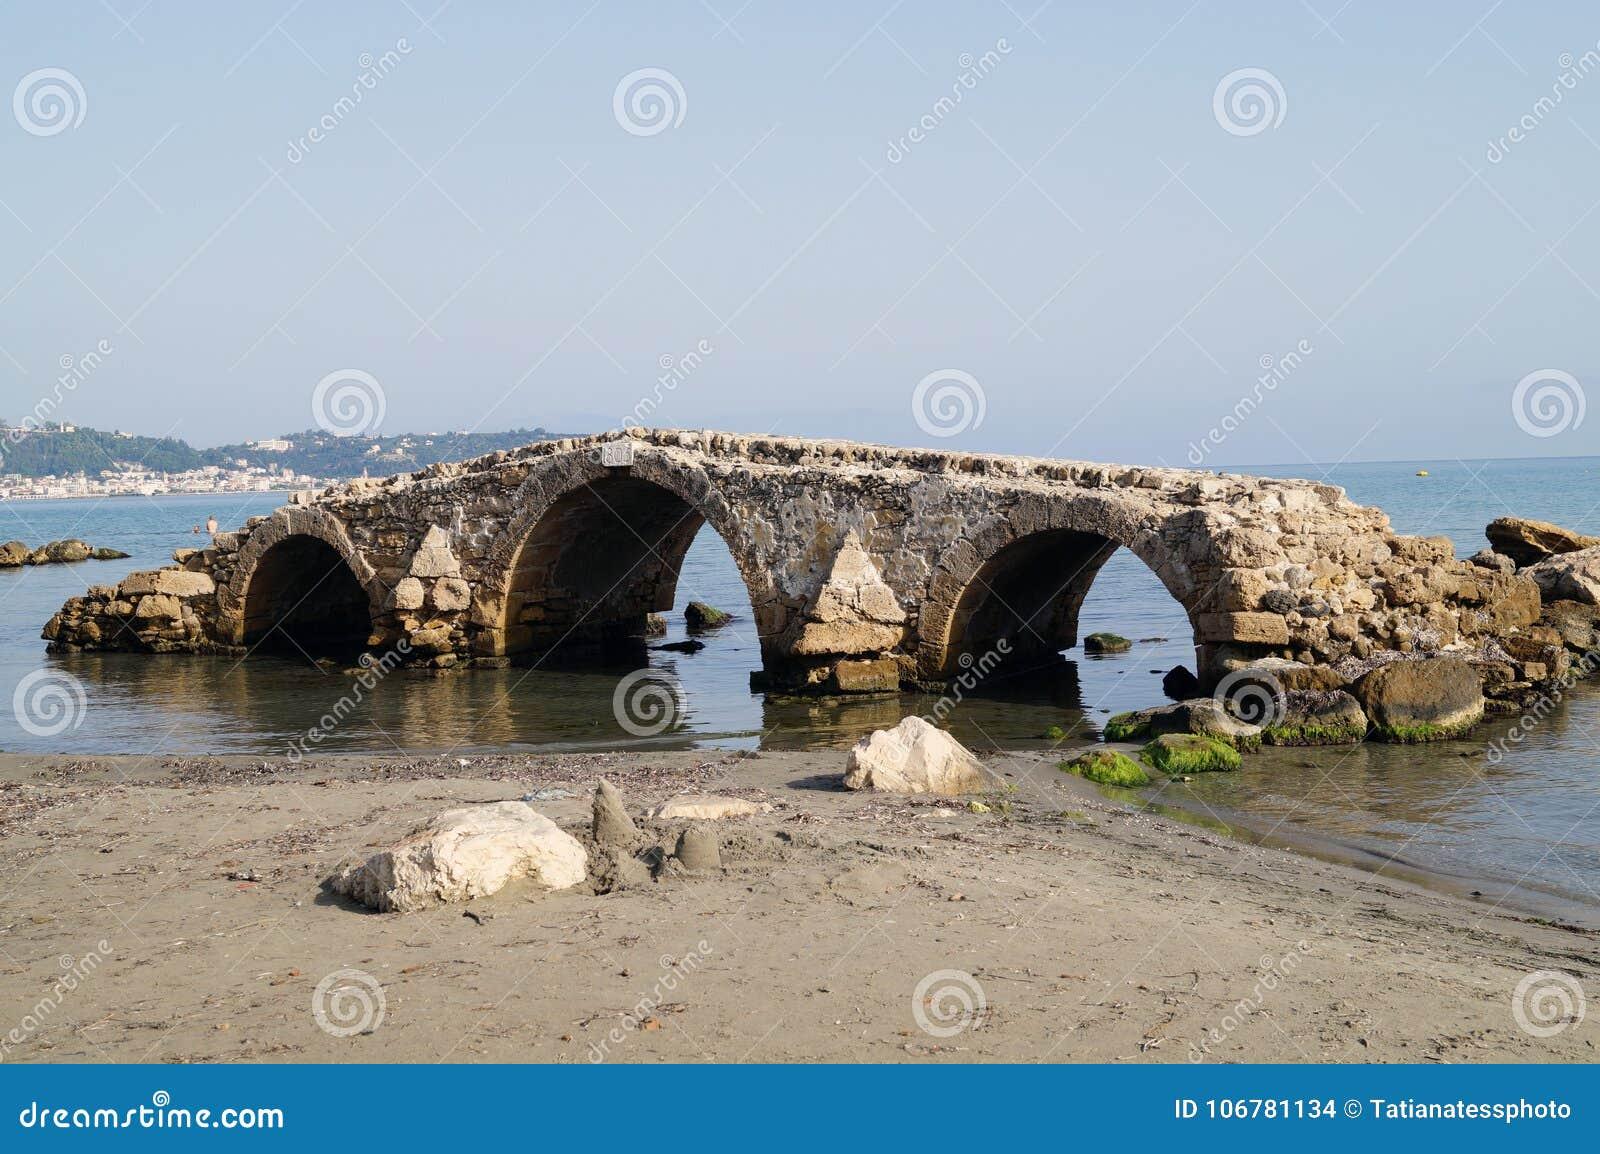 Old collapsing bridge on the island of zakynthos greece...